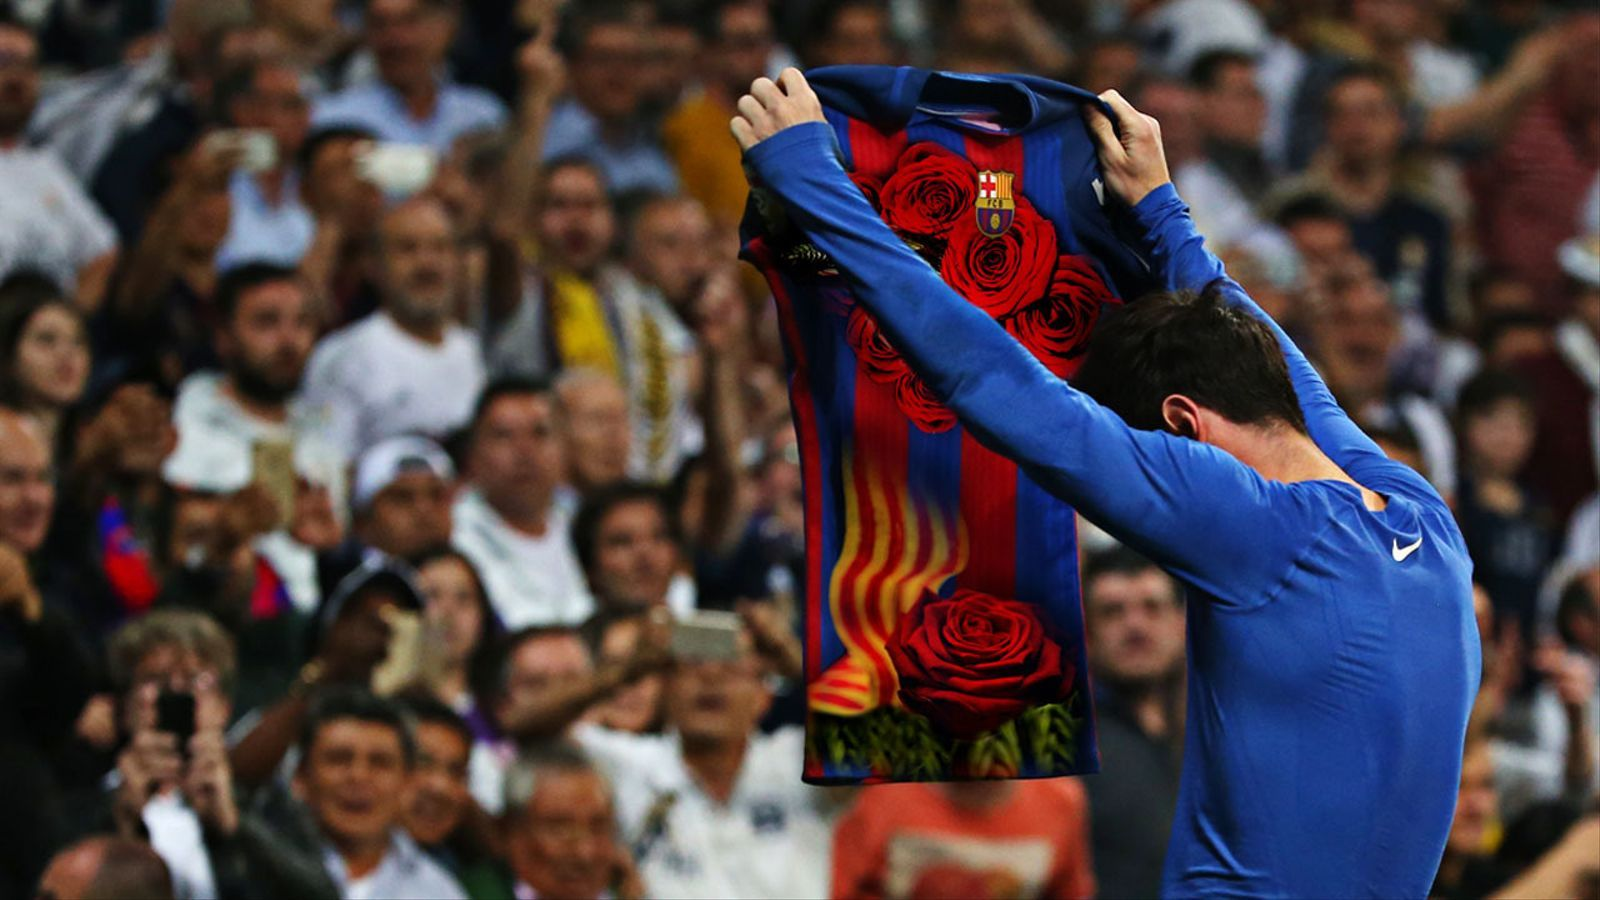 L'anàlisi d'Antoni Bassas: 'Capdevila i Bosh, Sergi Roberto i Messi'